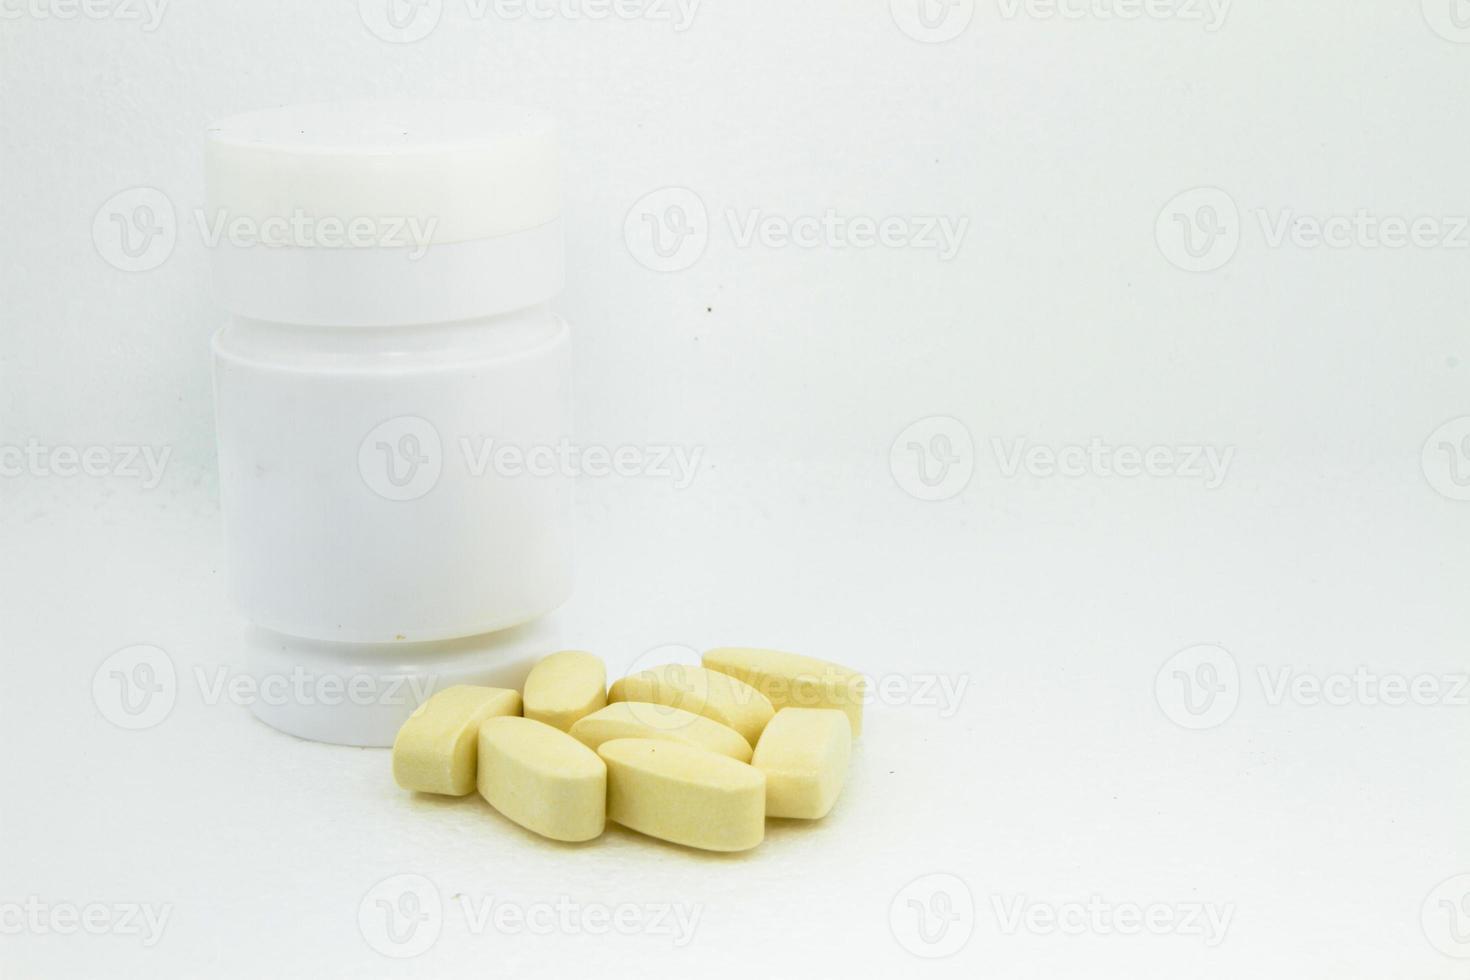 médecine jaune photo